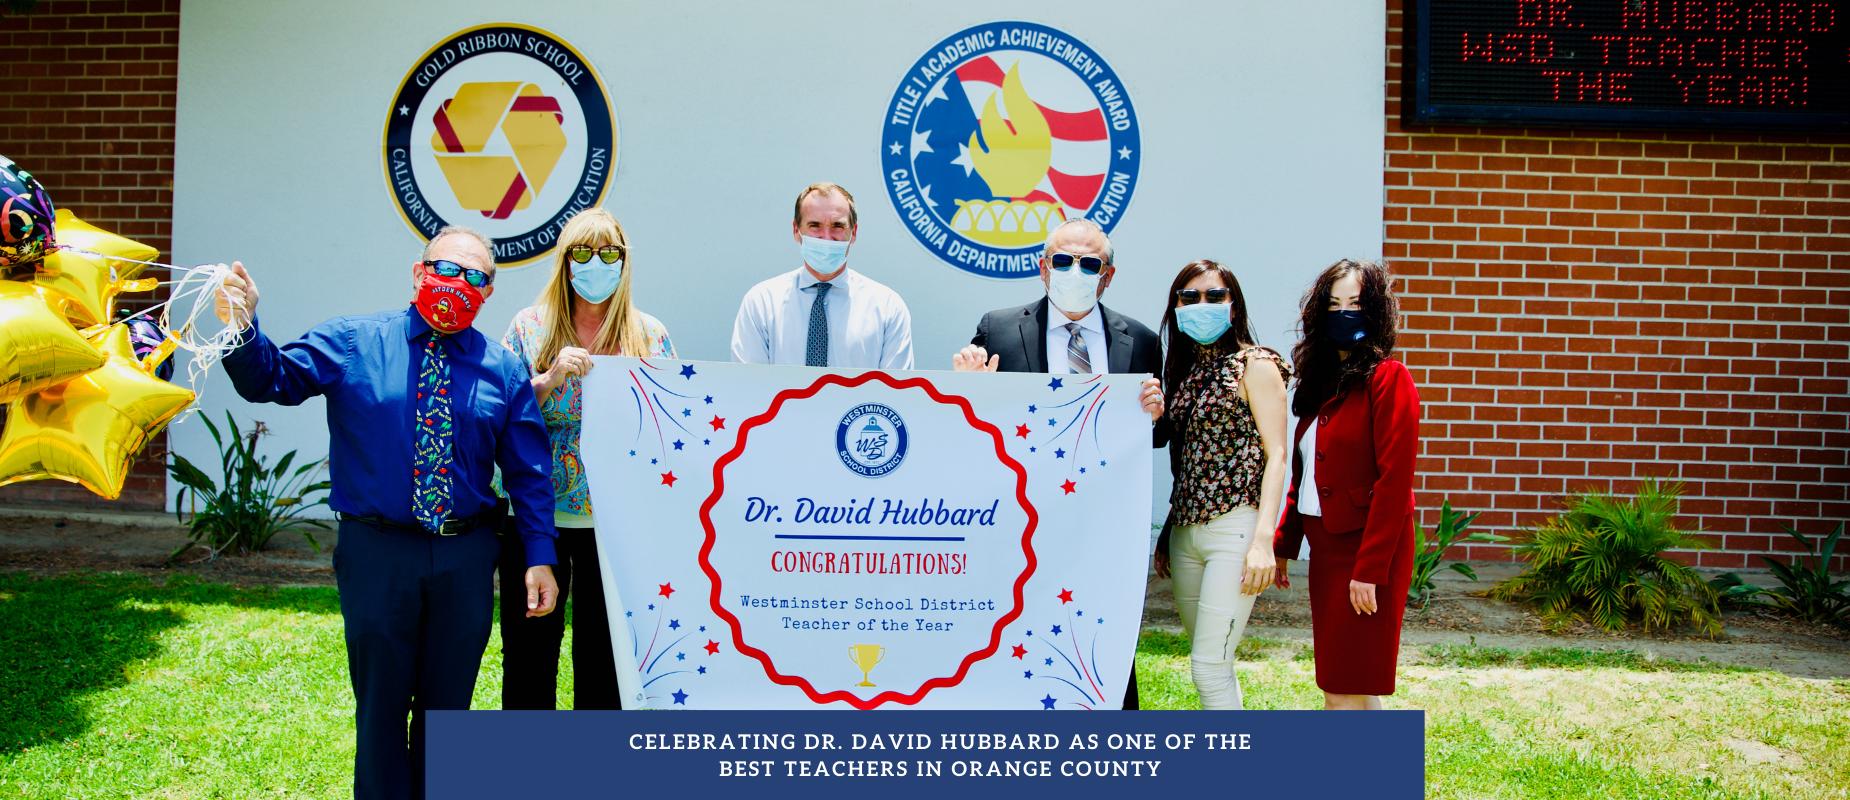 Celebrating Dr. David Hubbard, WSD Teacher of the Year